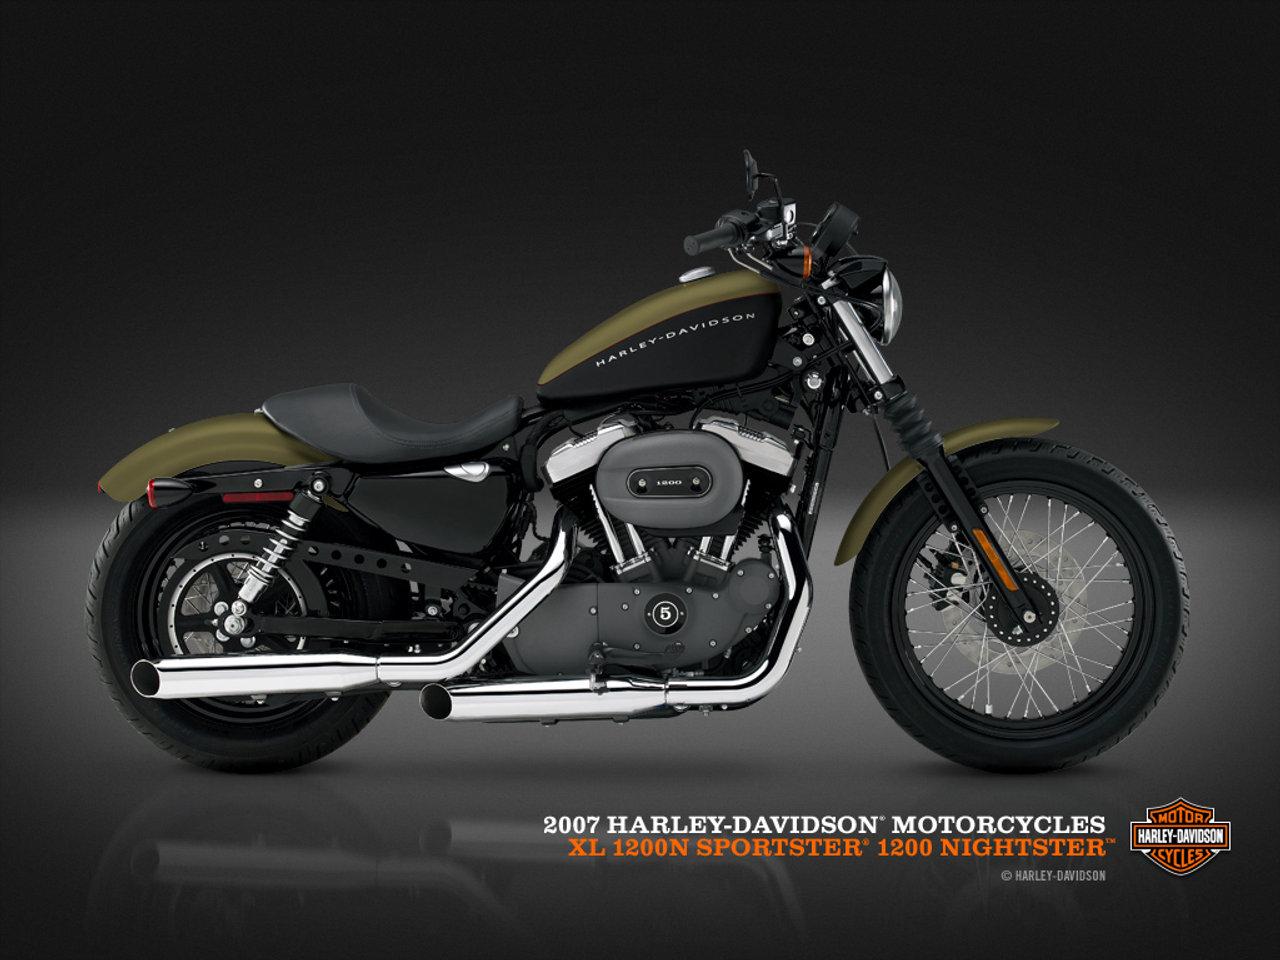 Harley Davidson Sportster Wallpaper 7414 Hd Wallpapers in Bikes 1280x960